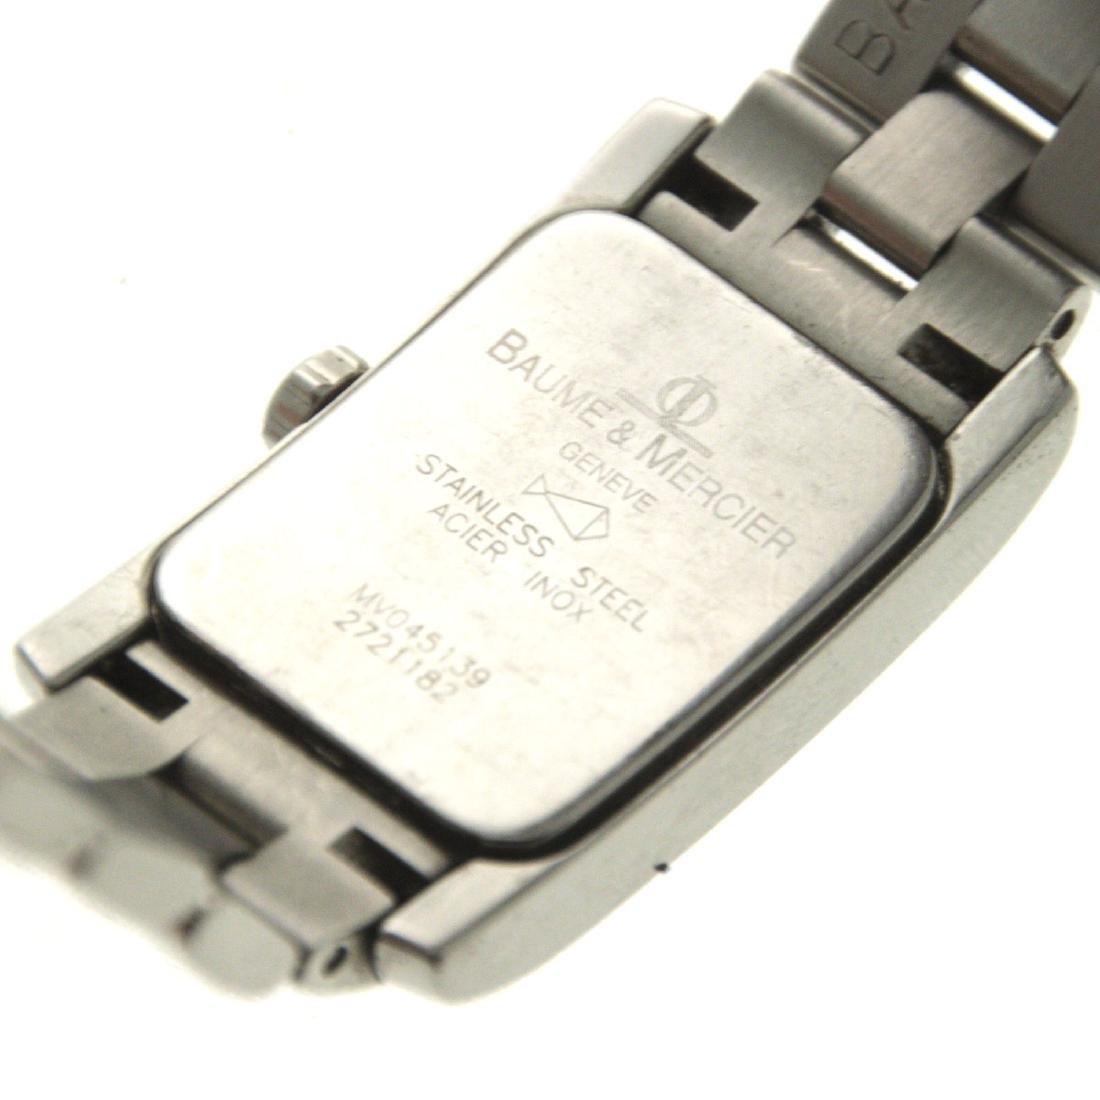 Baume & Mercier Lady's Wrist Watch. - 3